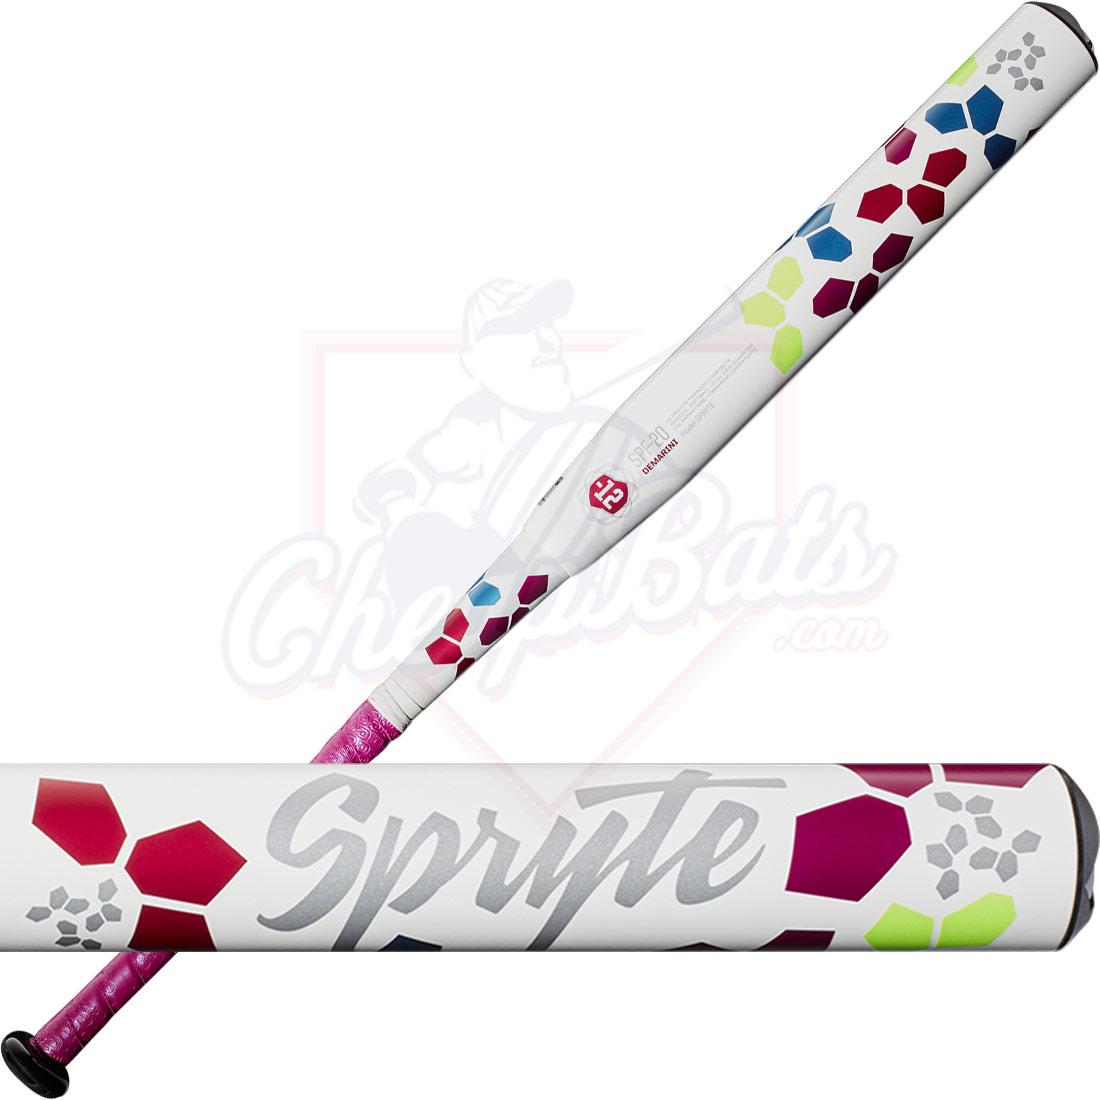 2020 DeMarini Spryte Fastpitch Softball Bat -12oz WTDXSPF-20